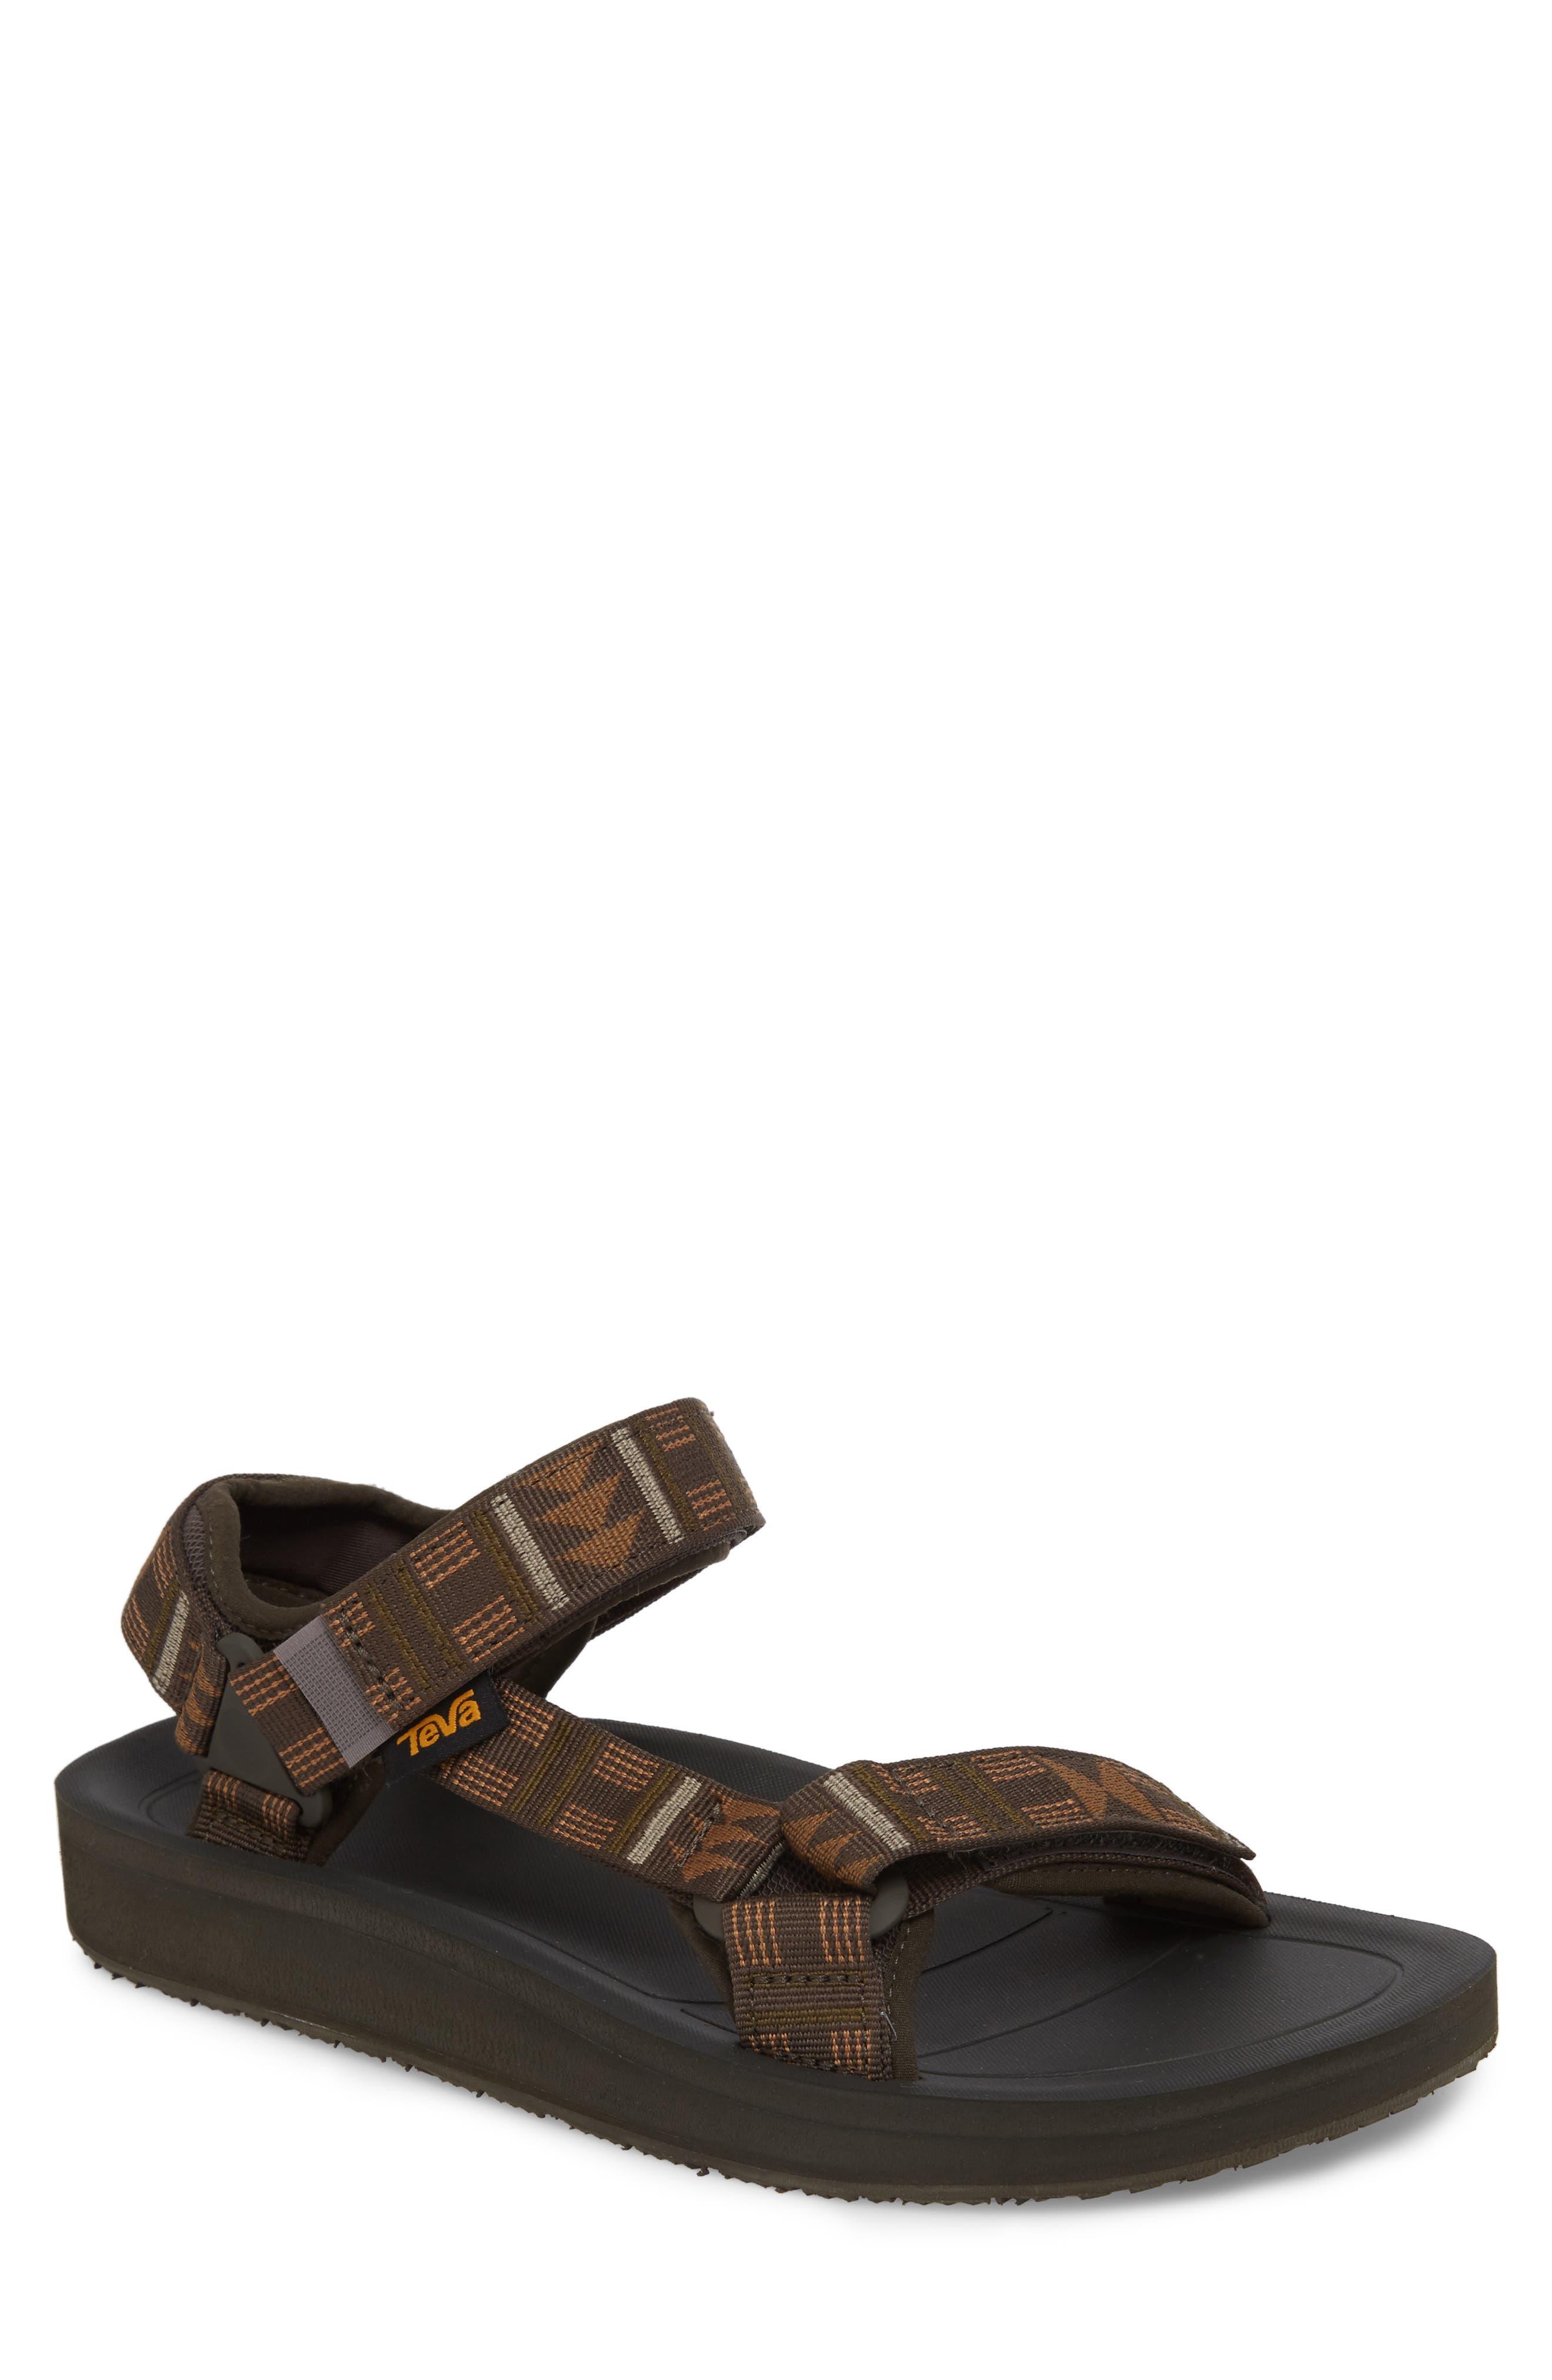 Original Universal Premier Sandal,                         Main,                         color, Brown Nylon